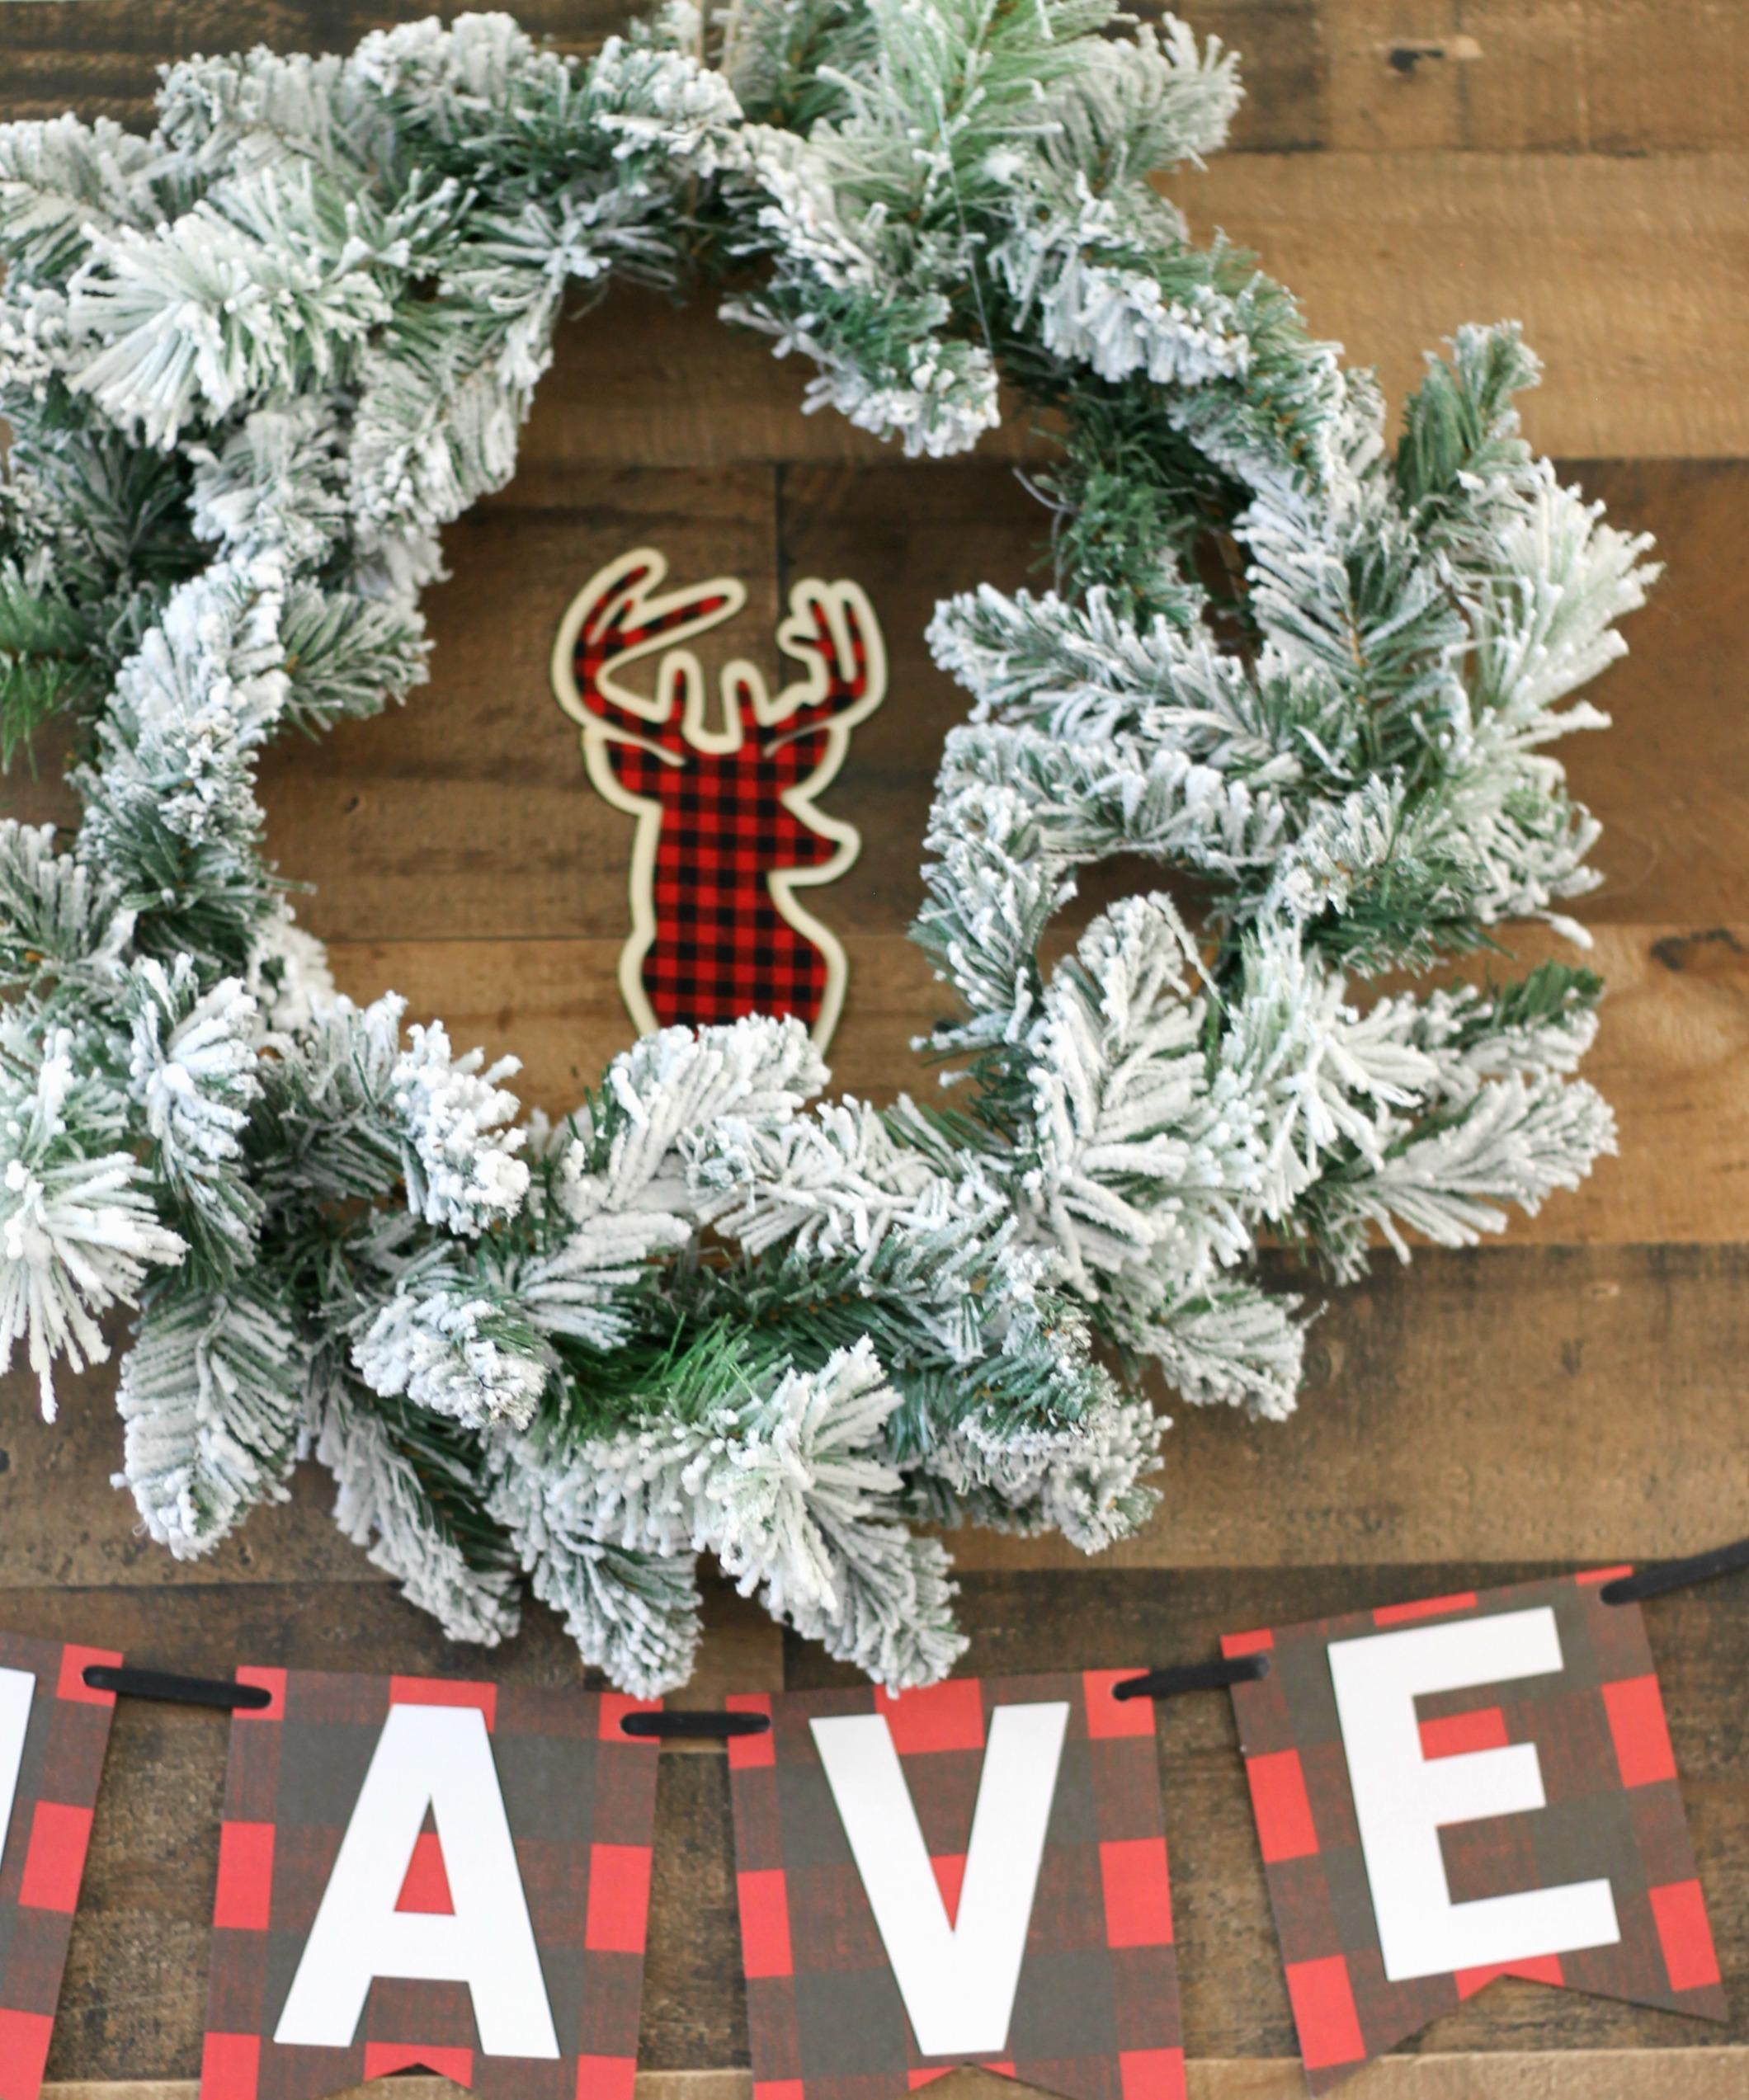 Christmas Party-Rustic Party-Christmas party decor-holiday wreath-flocking wreath decor-christmas party decor-christmas drink station-christmas ideas-www.SugarPartiesLA.com.jpg